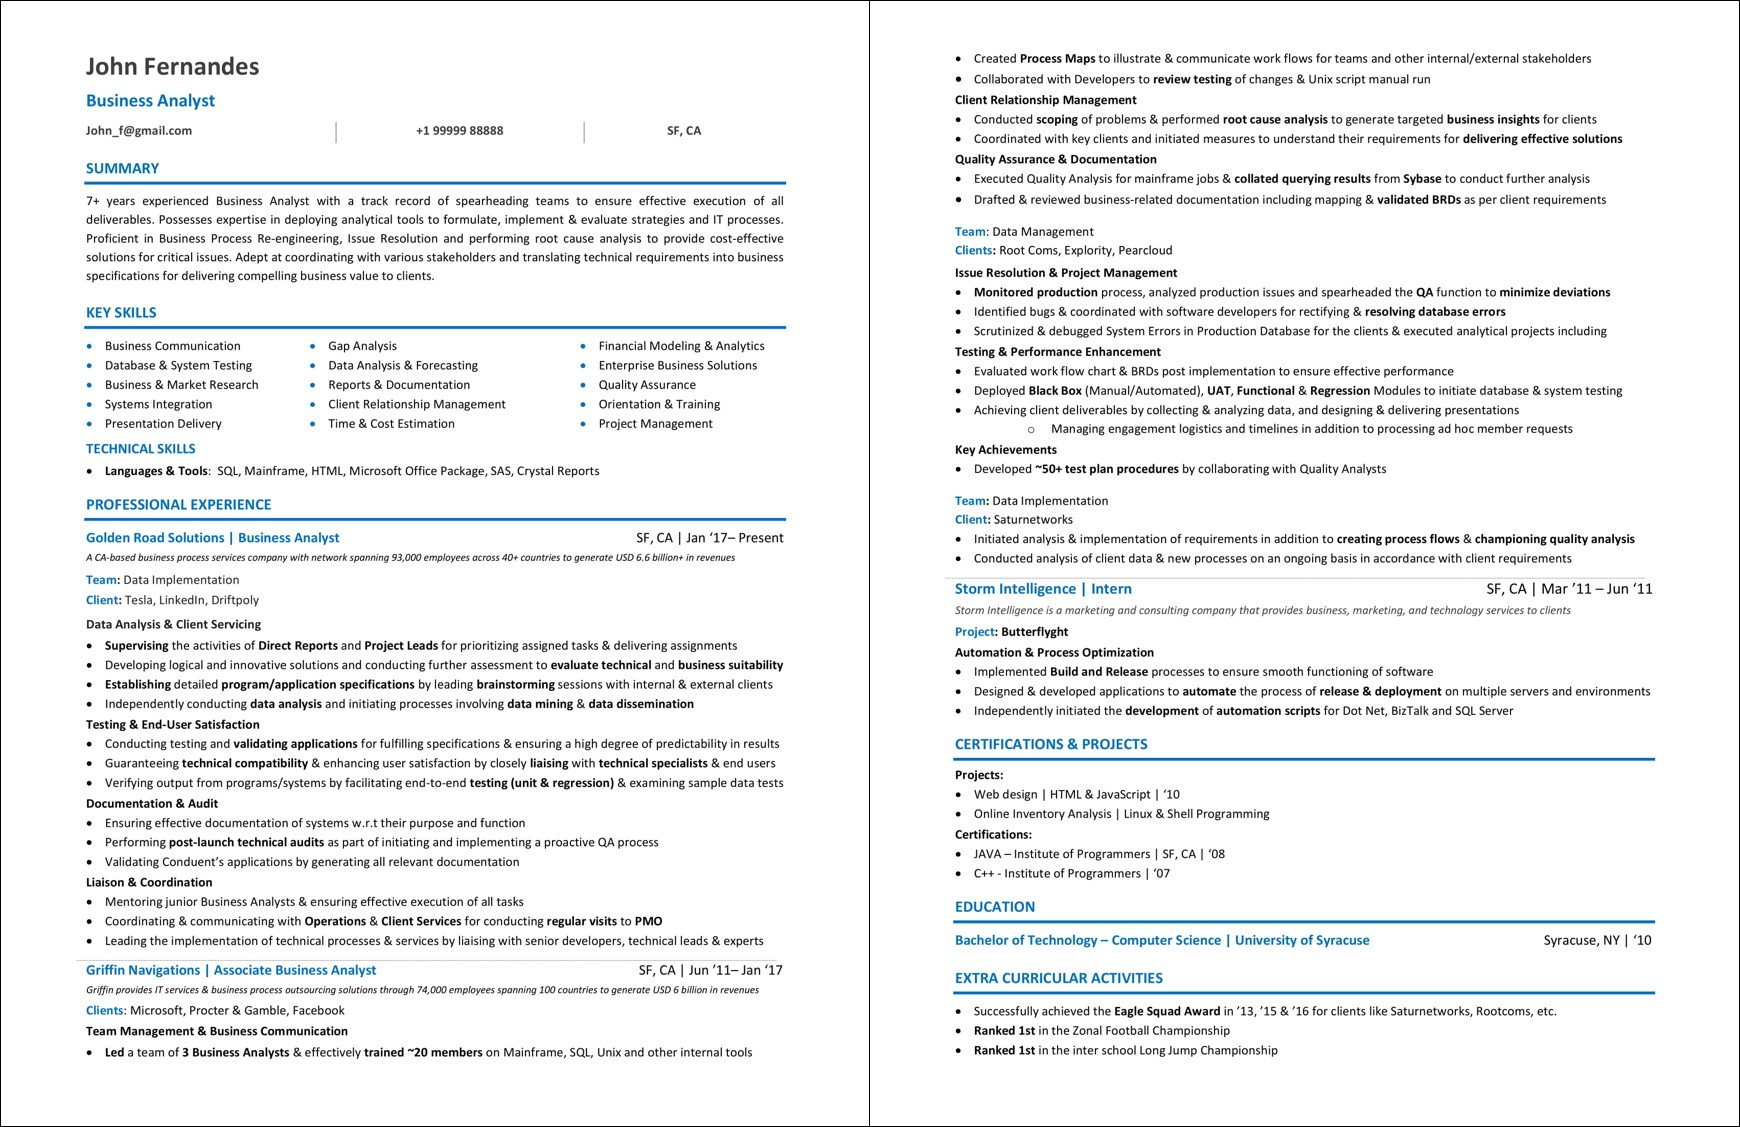 Sample-Business-Analyst-Resume